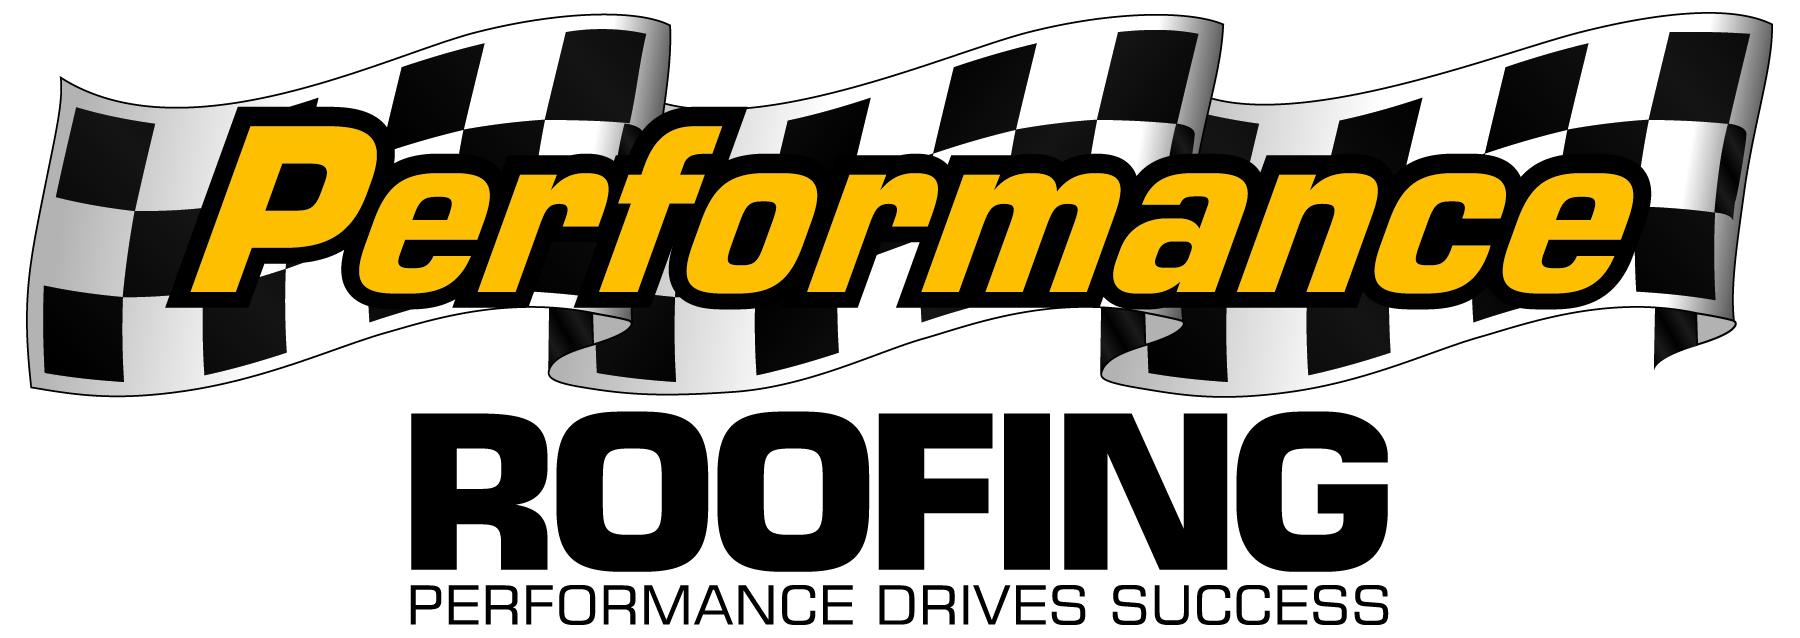 * Performance Roofing LLC - Platinum Partner